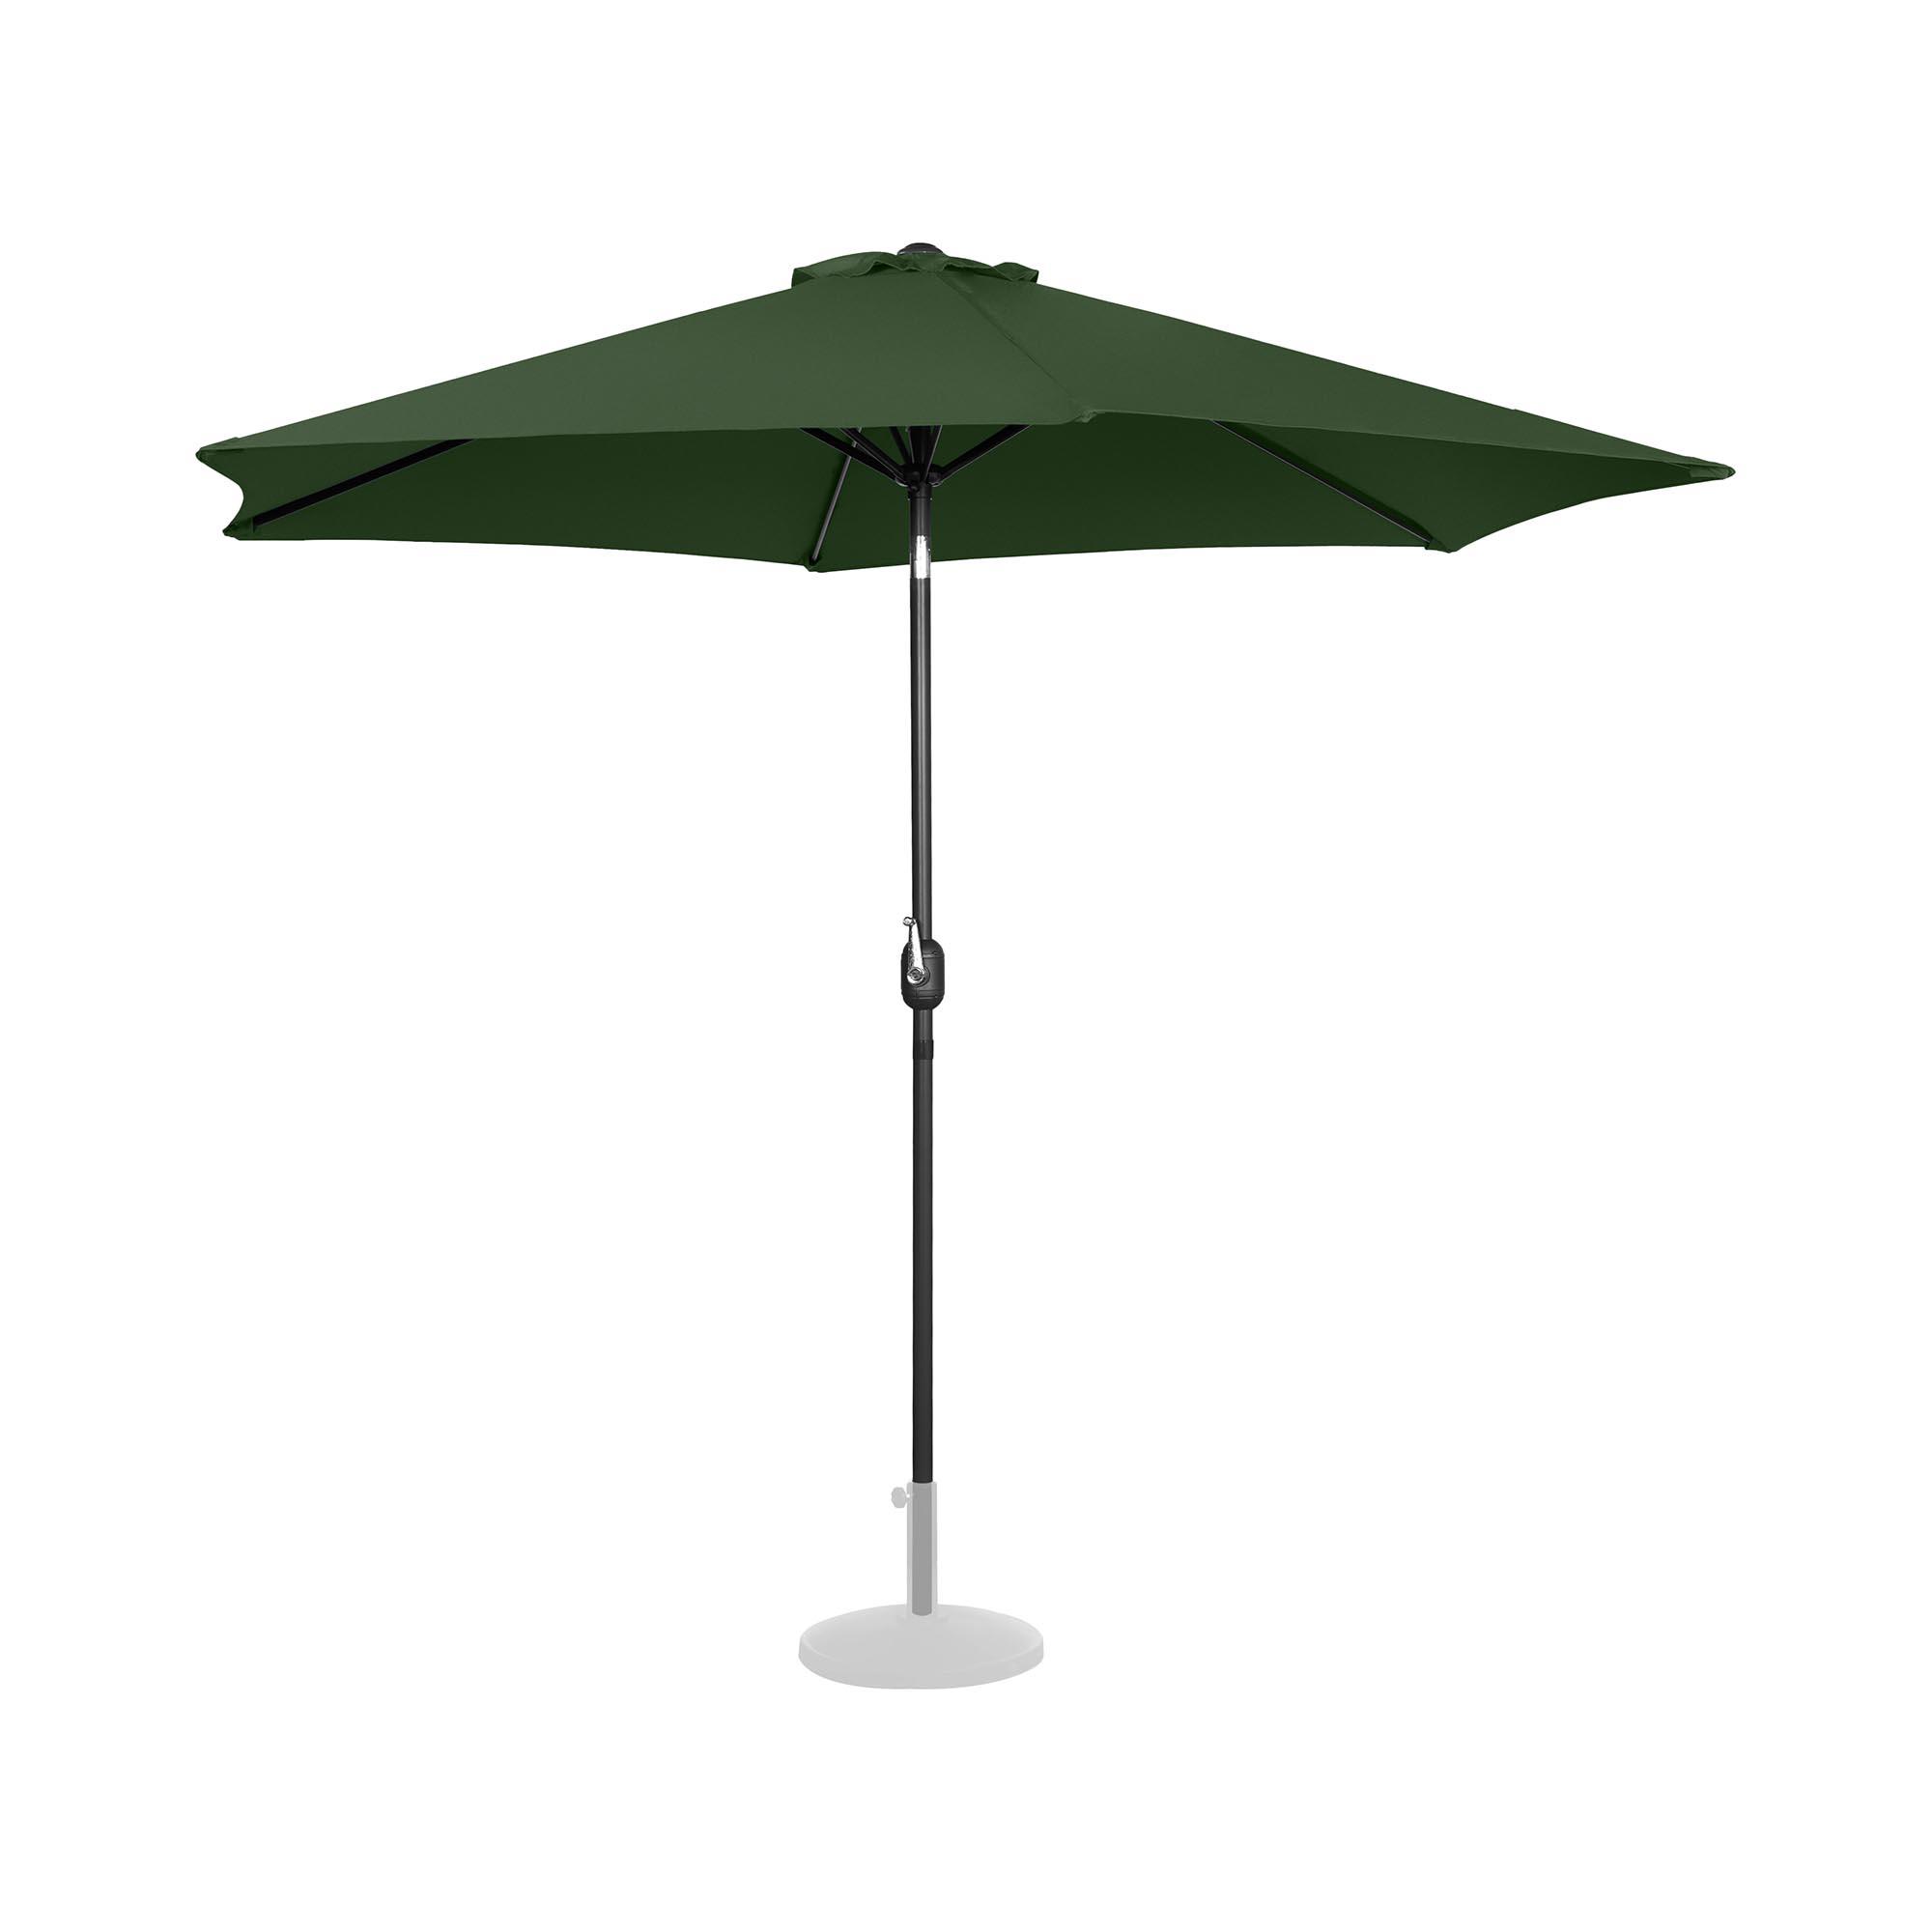 Uniprodo Sonnenschirm groß - grün - sechseckig - Ø 300 cm - neigbar UNI_UMBRELLA_TR300GR